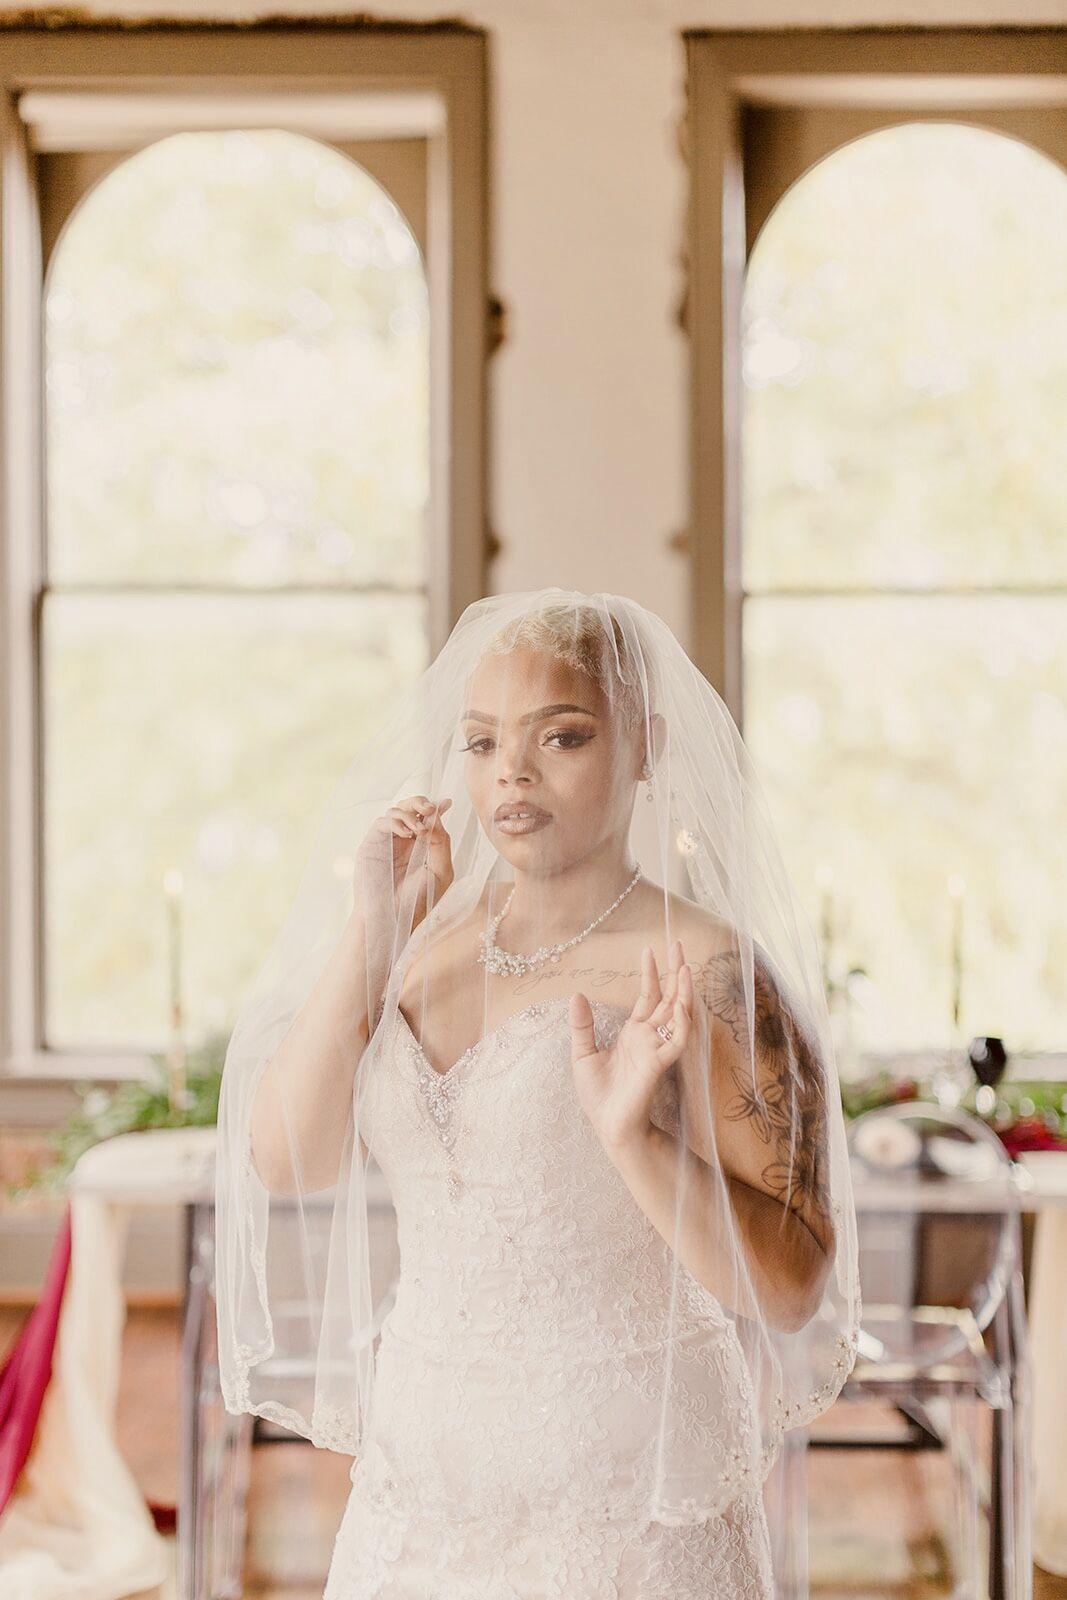 Evanna S Bridal Boutique The Knot